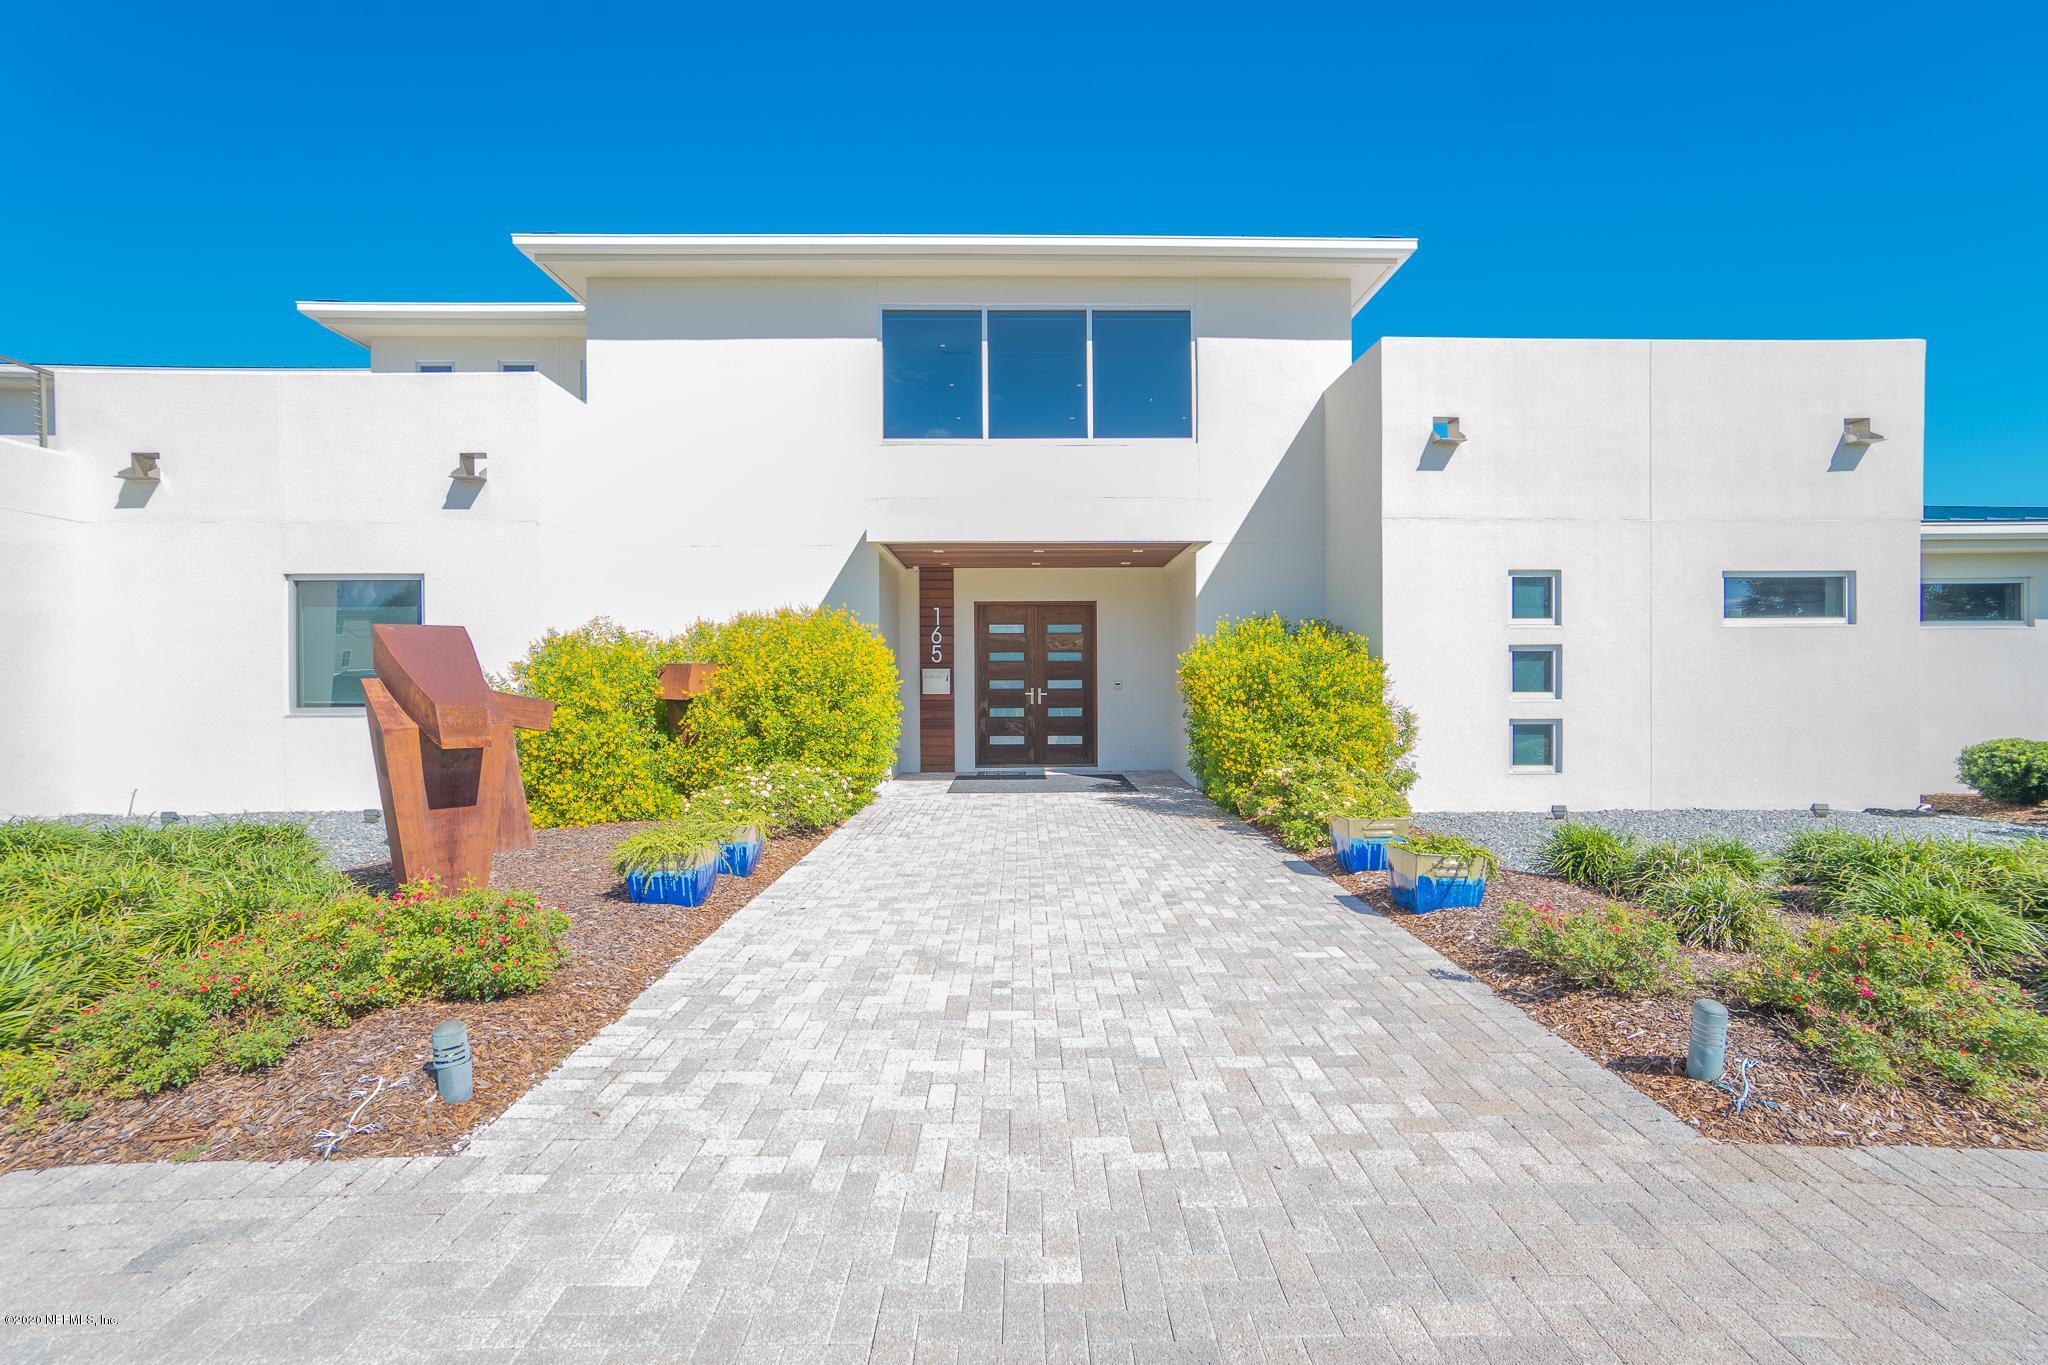 165 INLET, ST AUGUSTINE, FLORIDA 32080, 3 Bedrooms Bedrooms, ,4 BathroomsBathrooms,Residential,For sale,INLET,1079828